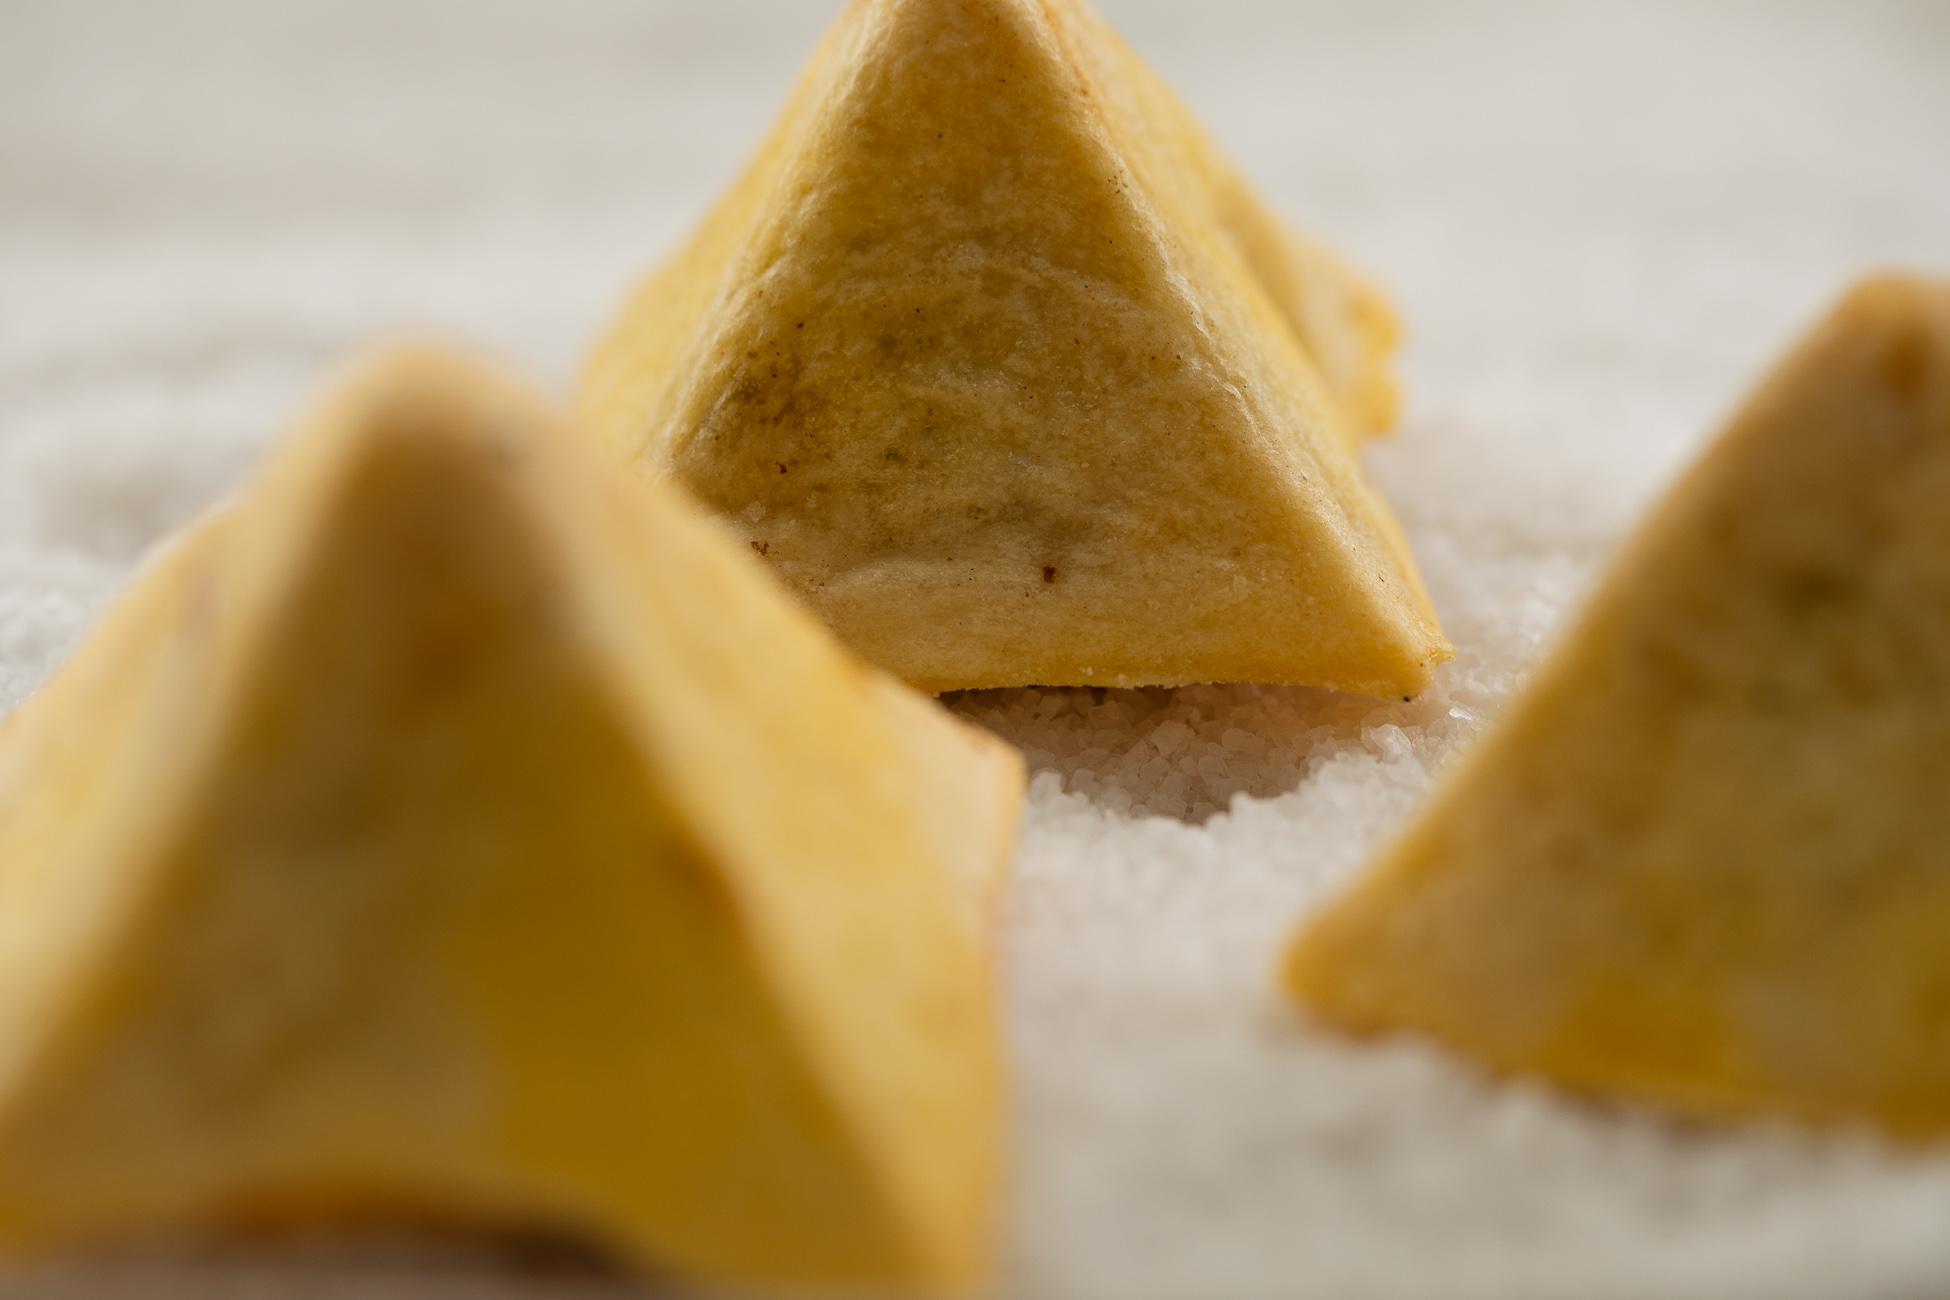 goncalo-barriga-photographer-editorial-food-lifestyle-040.jpg